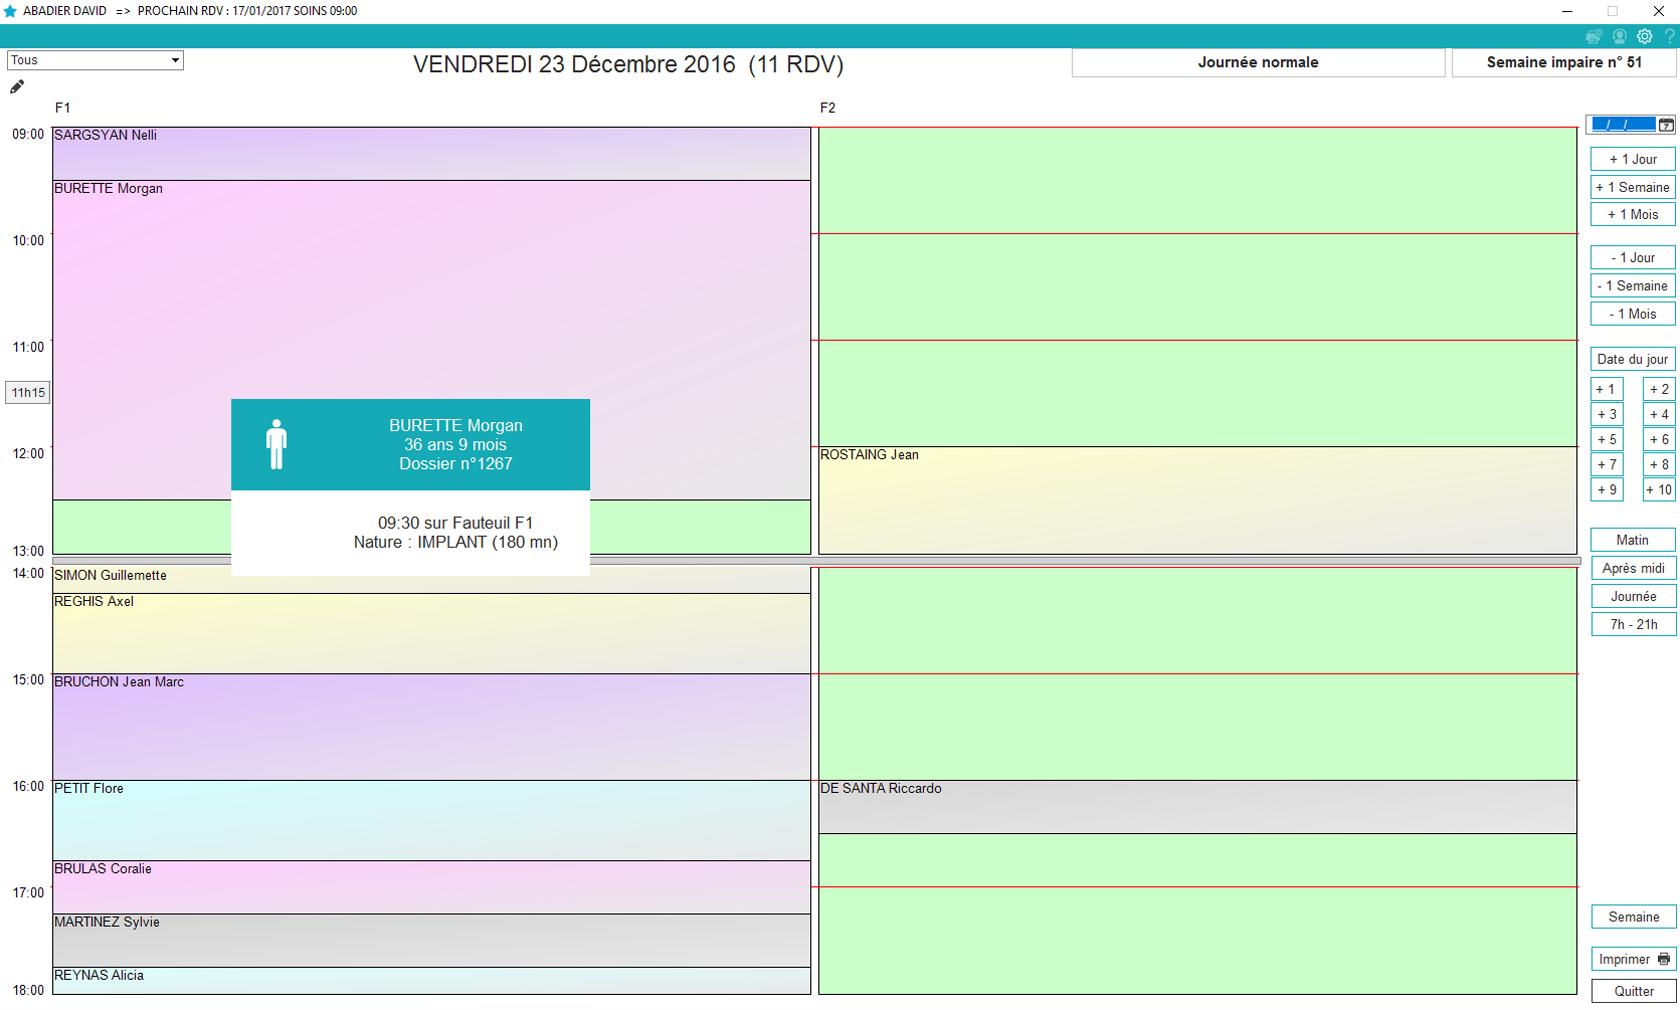 Agenda journée